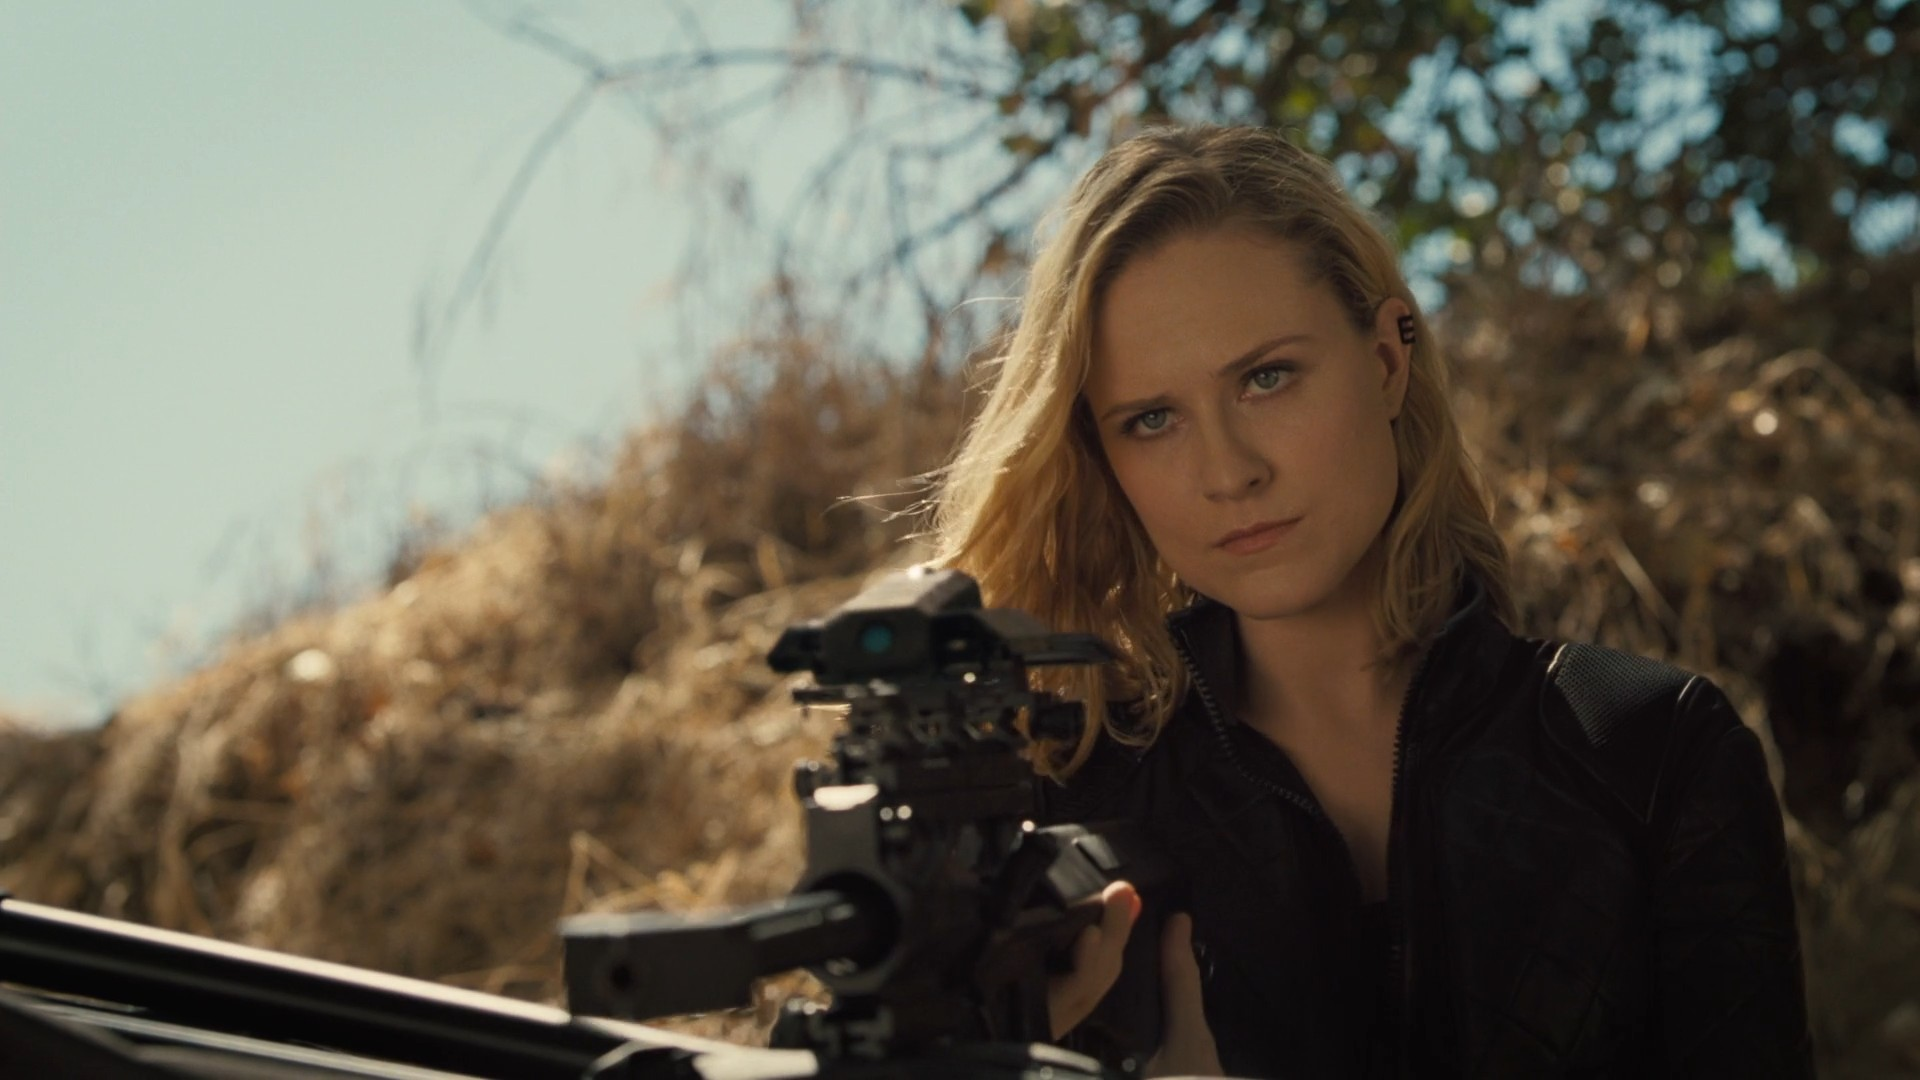 Westworld S03E07 Passed Pawn Evan Rachel Wood as Dolores